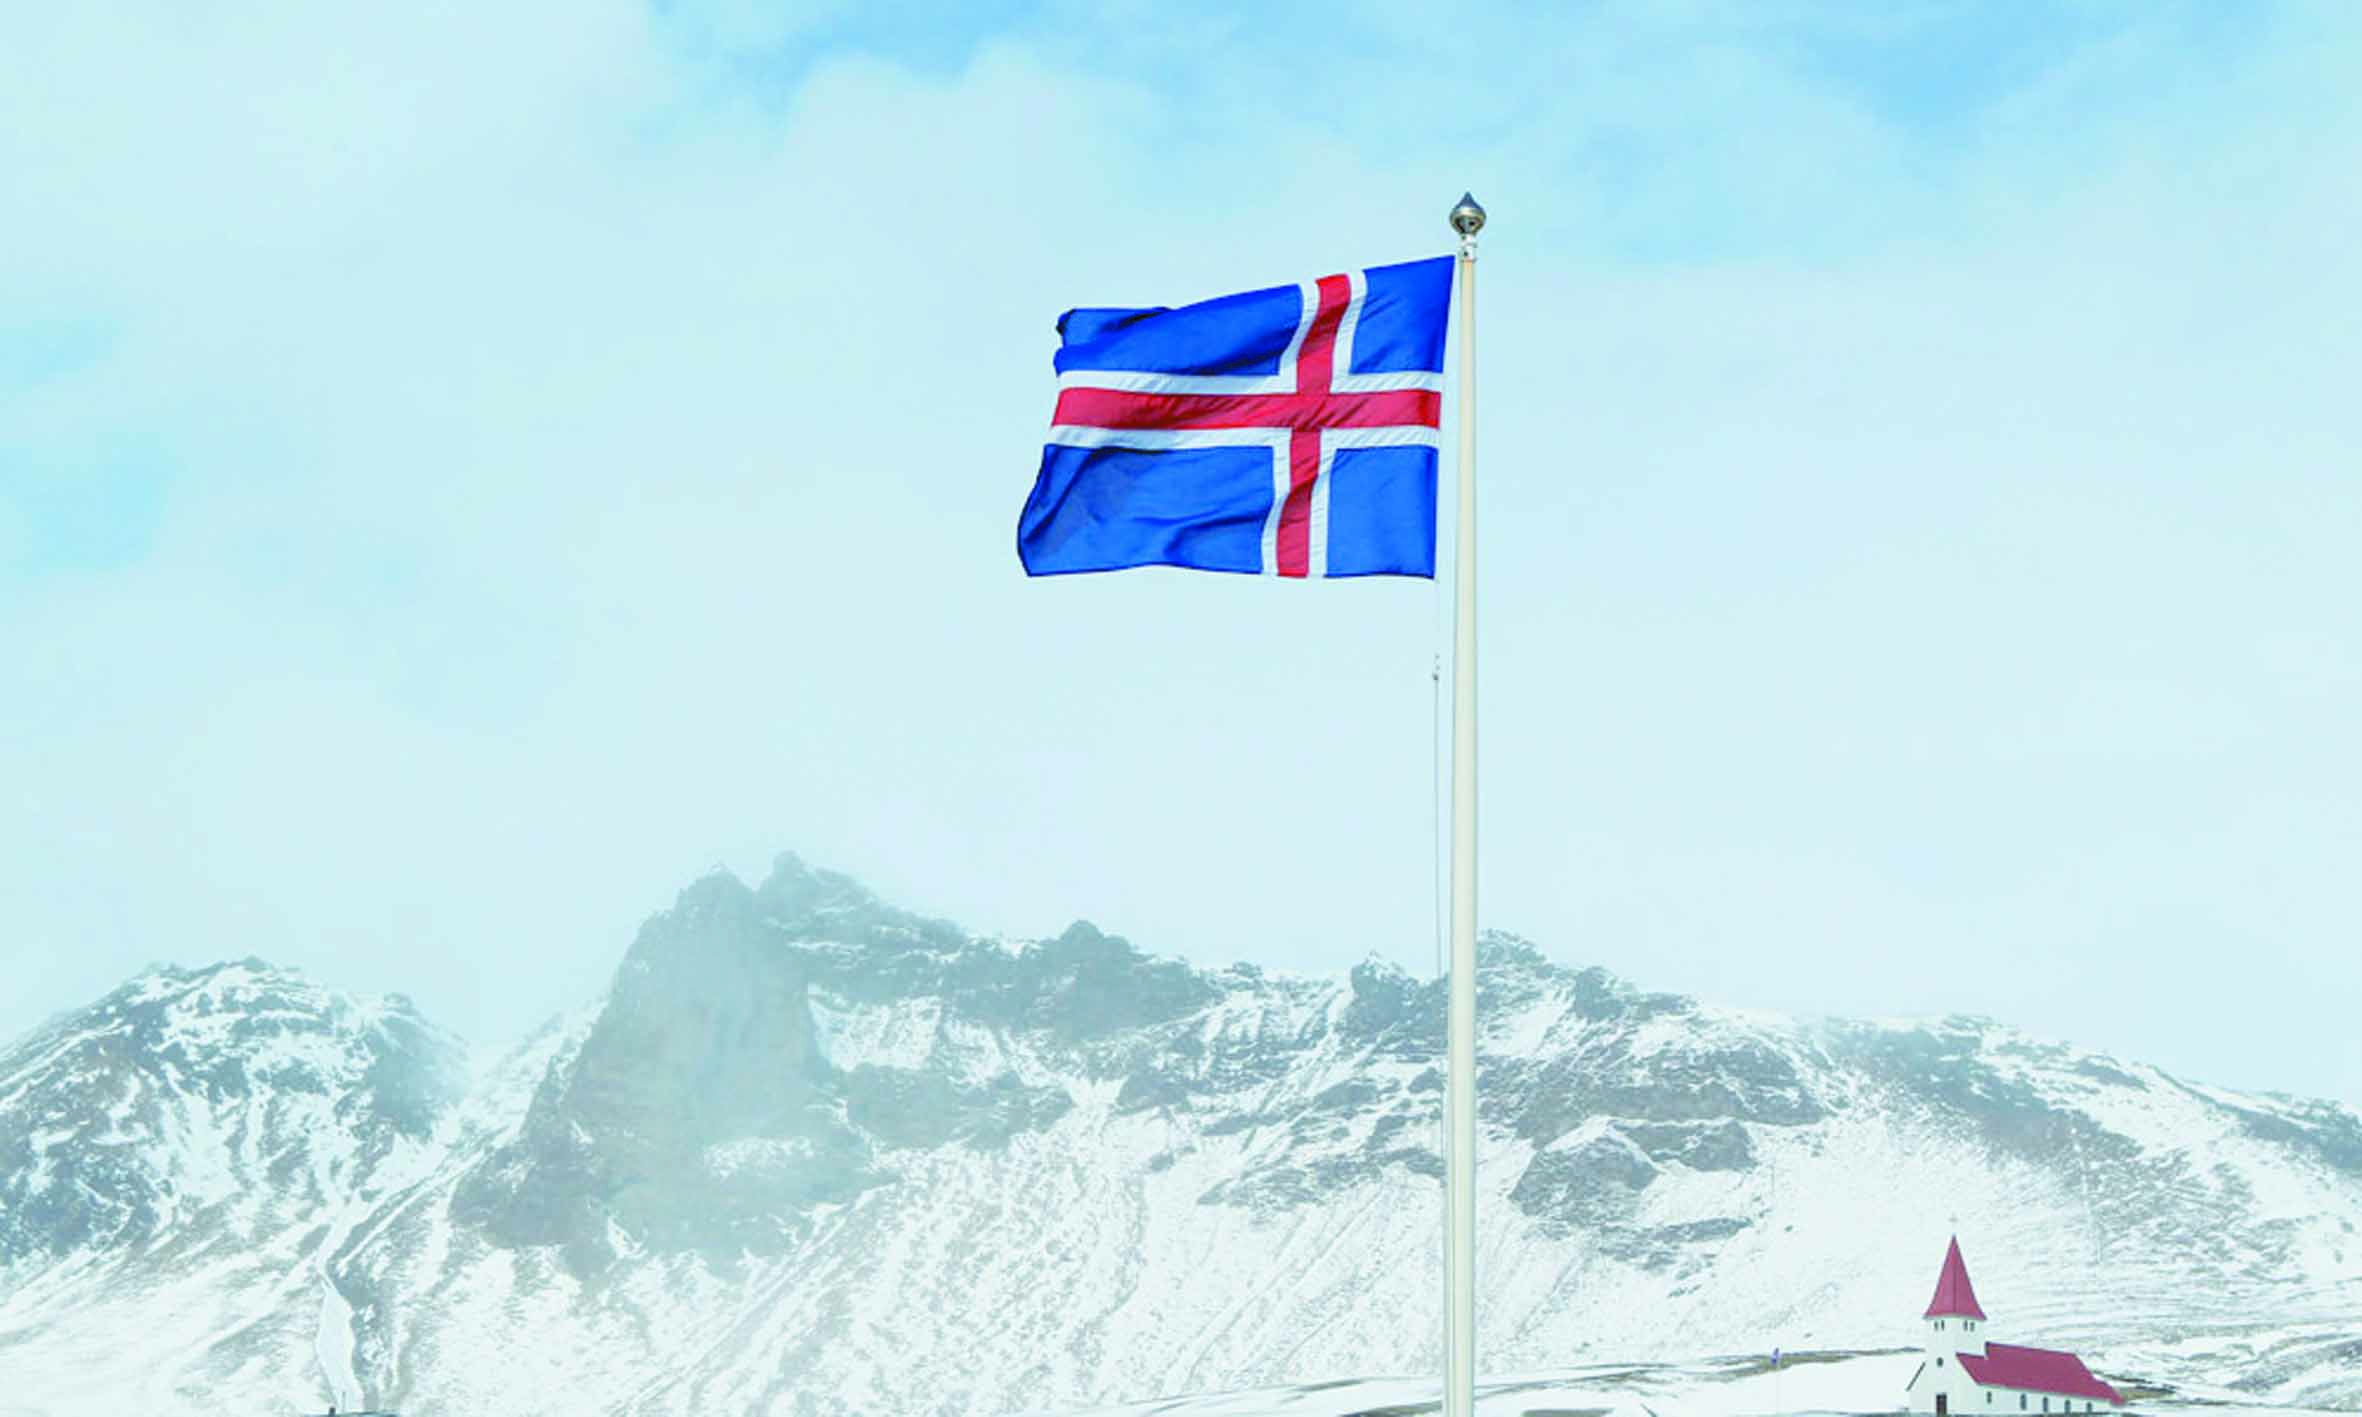 L'Islande, ses volcans, ses geysers... et ses bitcoins